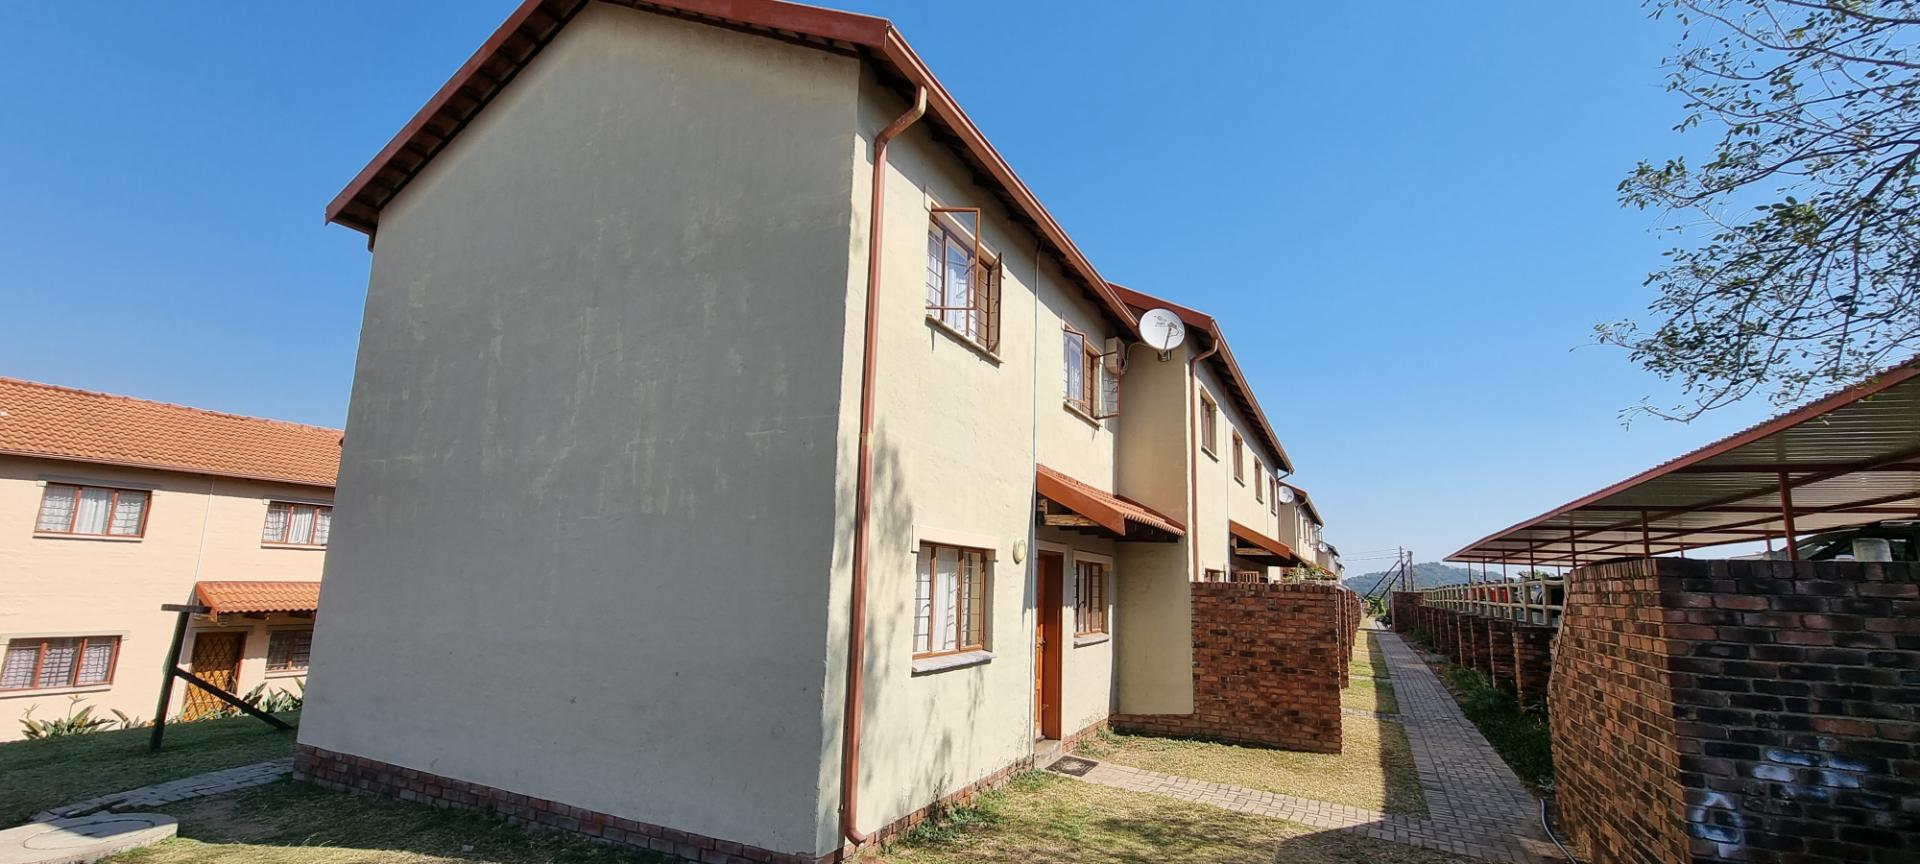 Apartment Rental Monthly in Karino